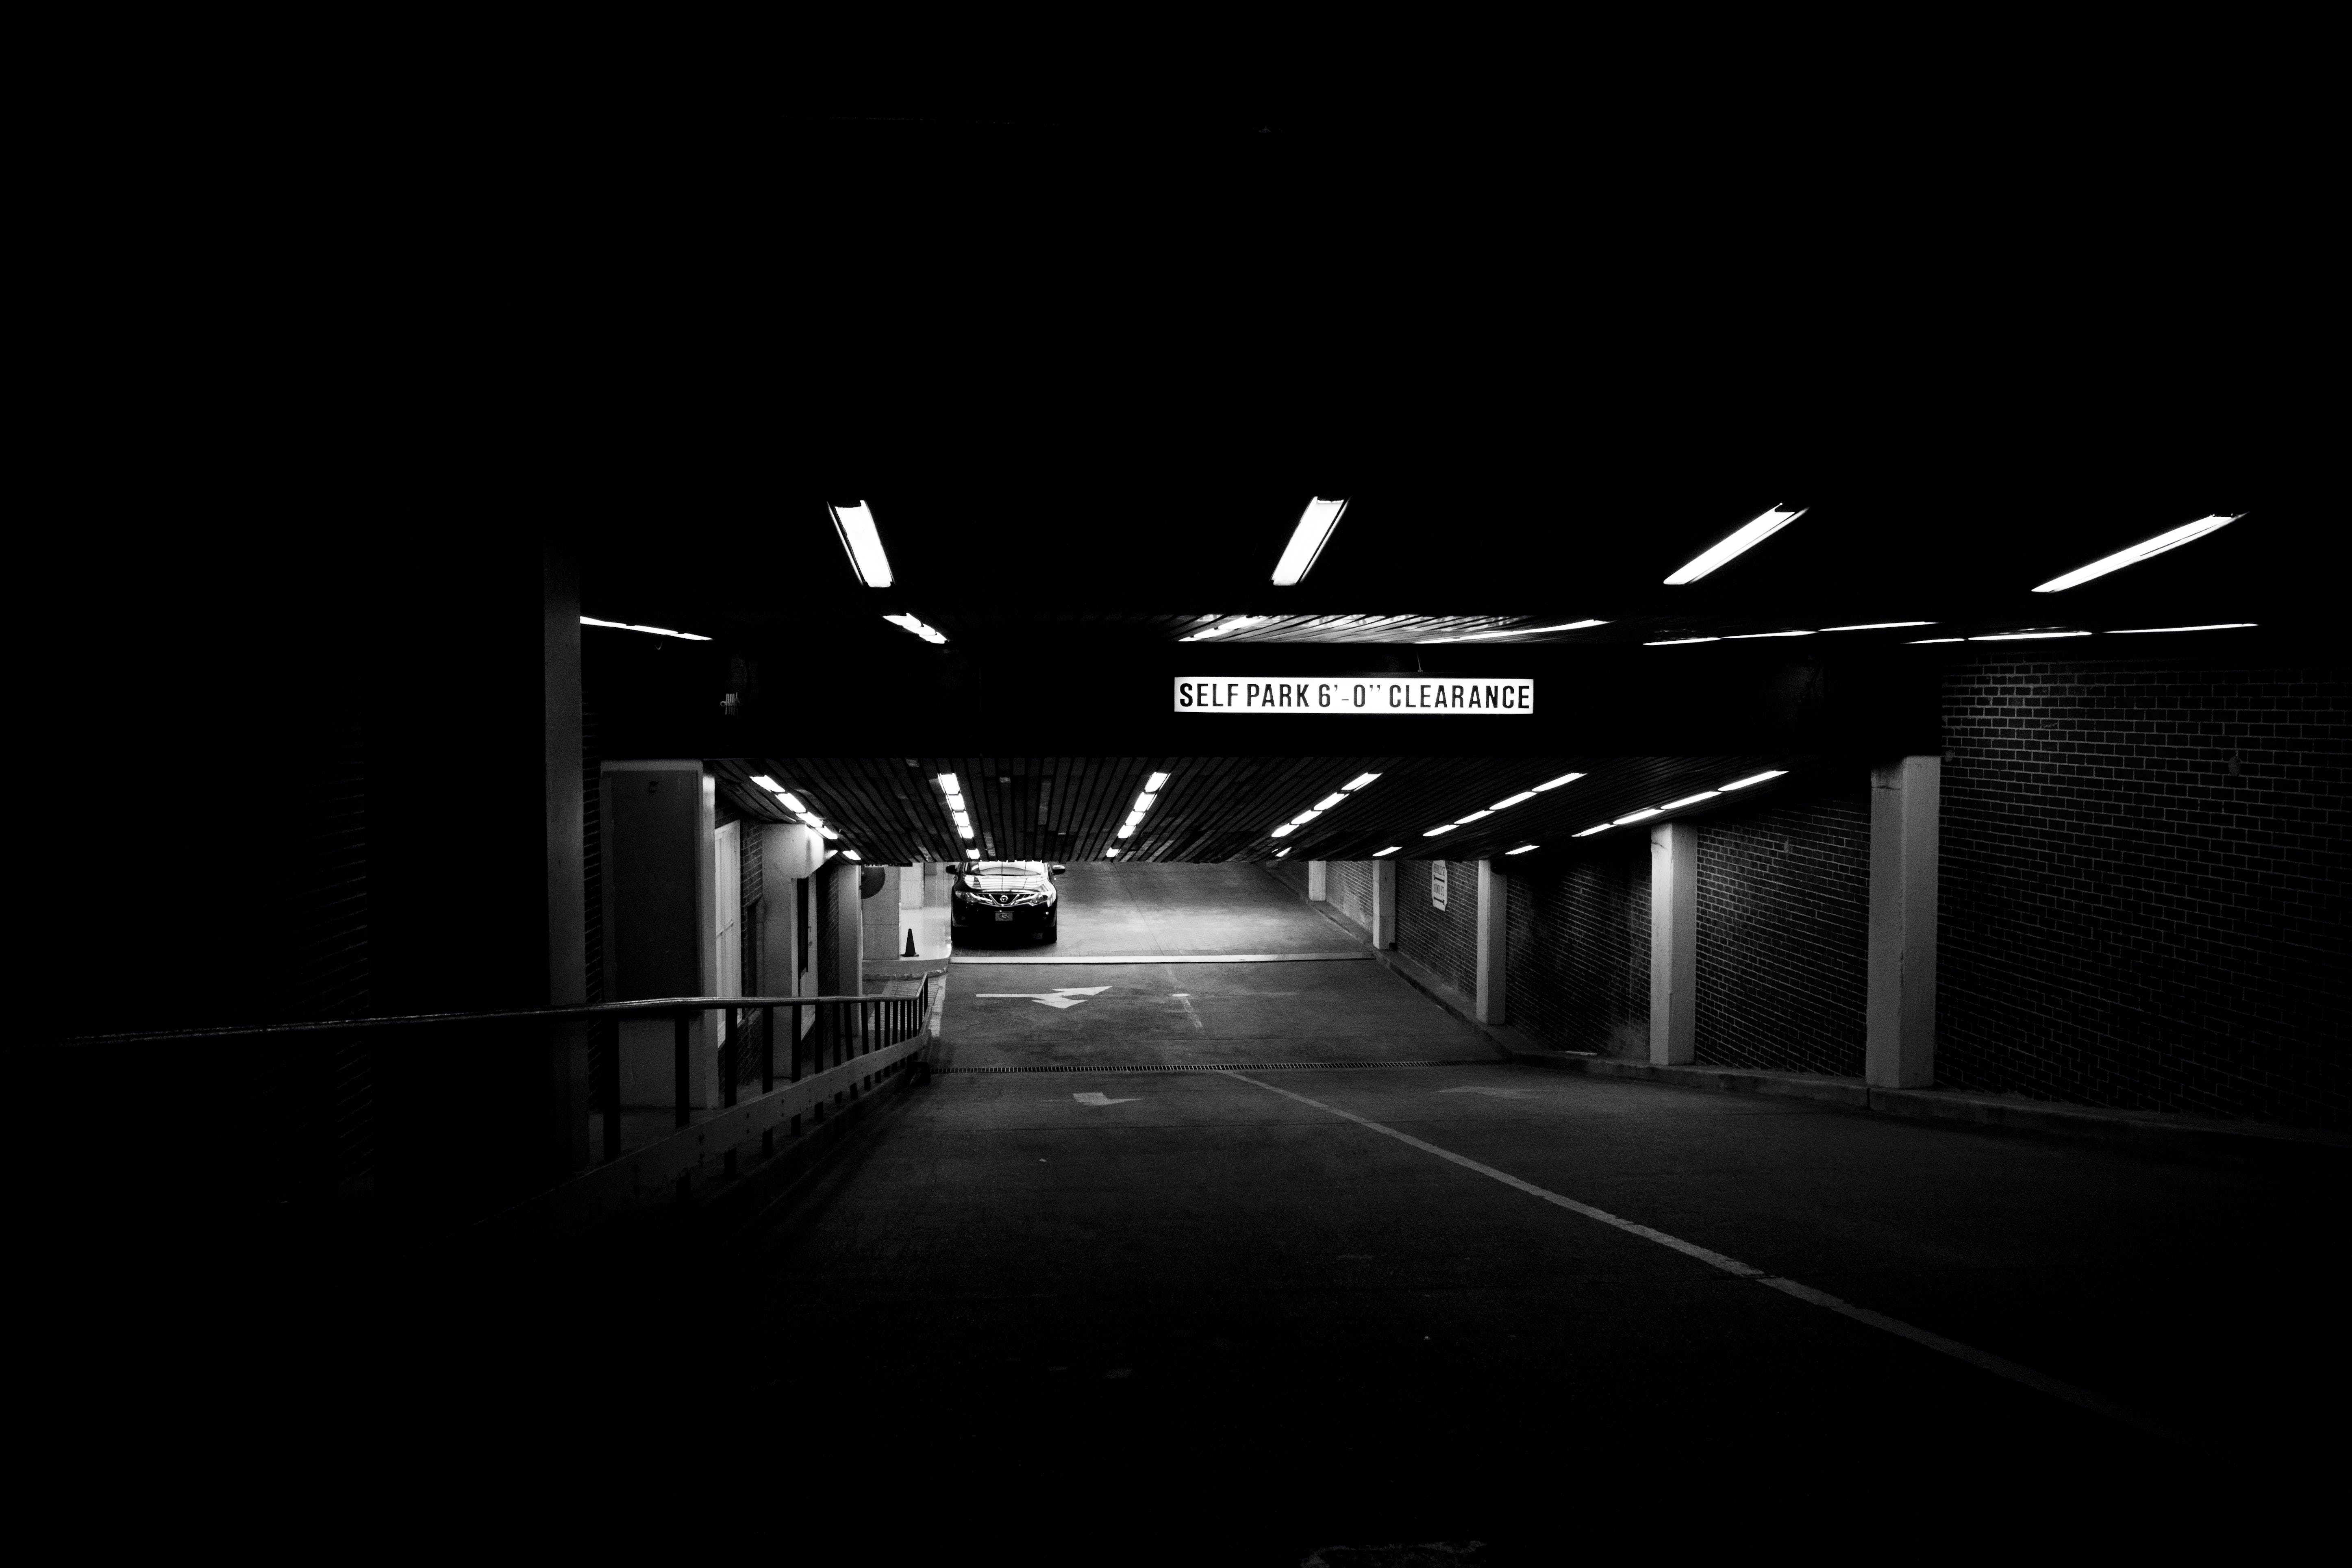 Grayscale Photo of a Concrete Road